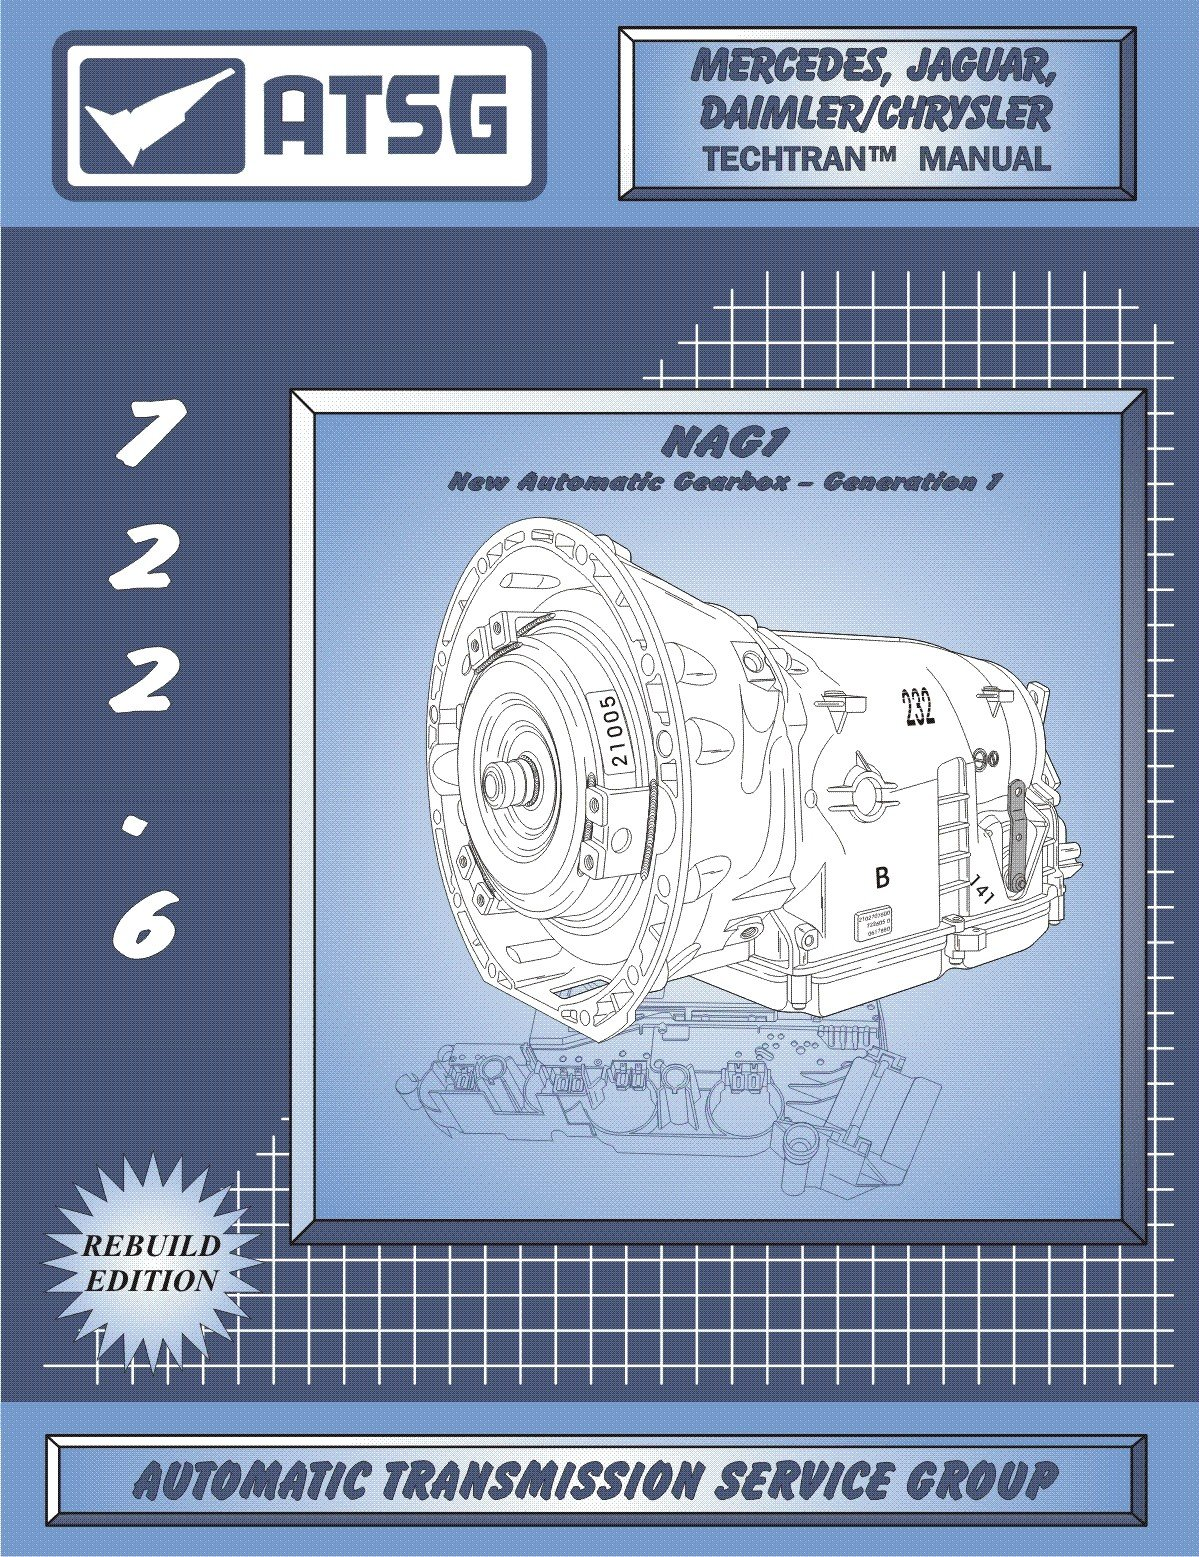 ATSG Mercedes 722.6 / NAG 1 Automatic Transmission Repair Manual (Mercedes  722.6 Transmission Fluid Dipstick